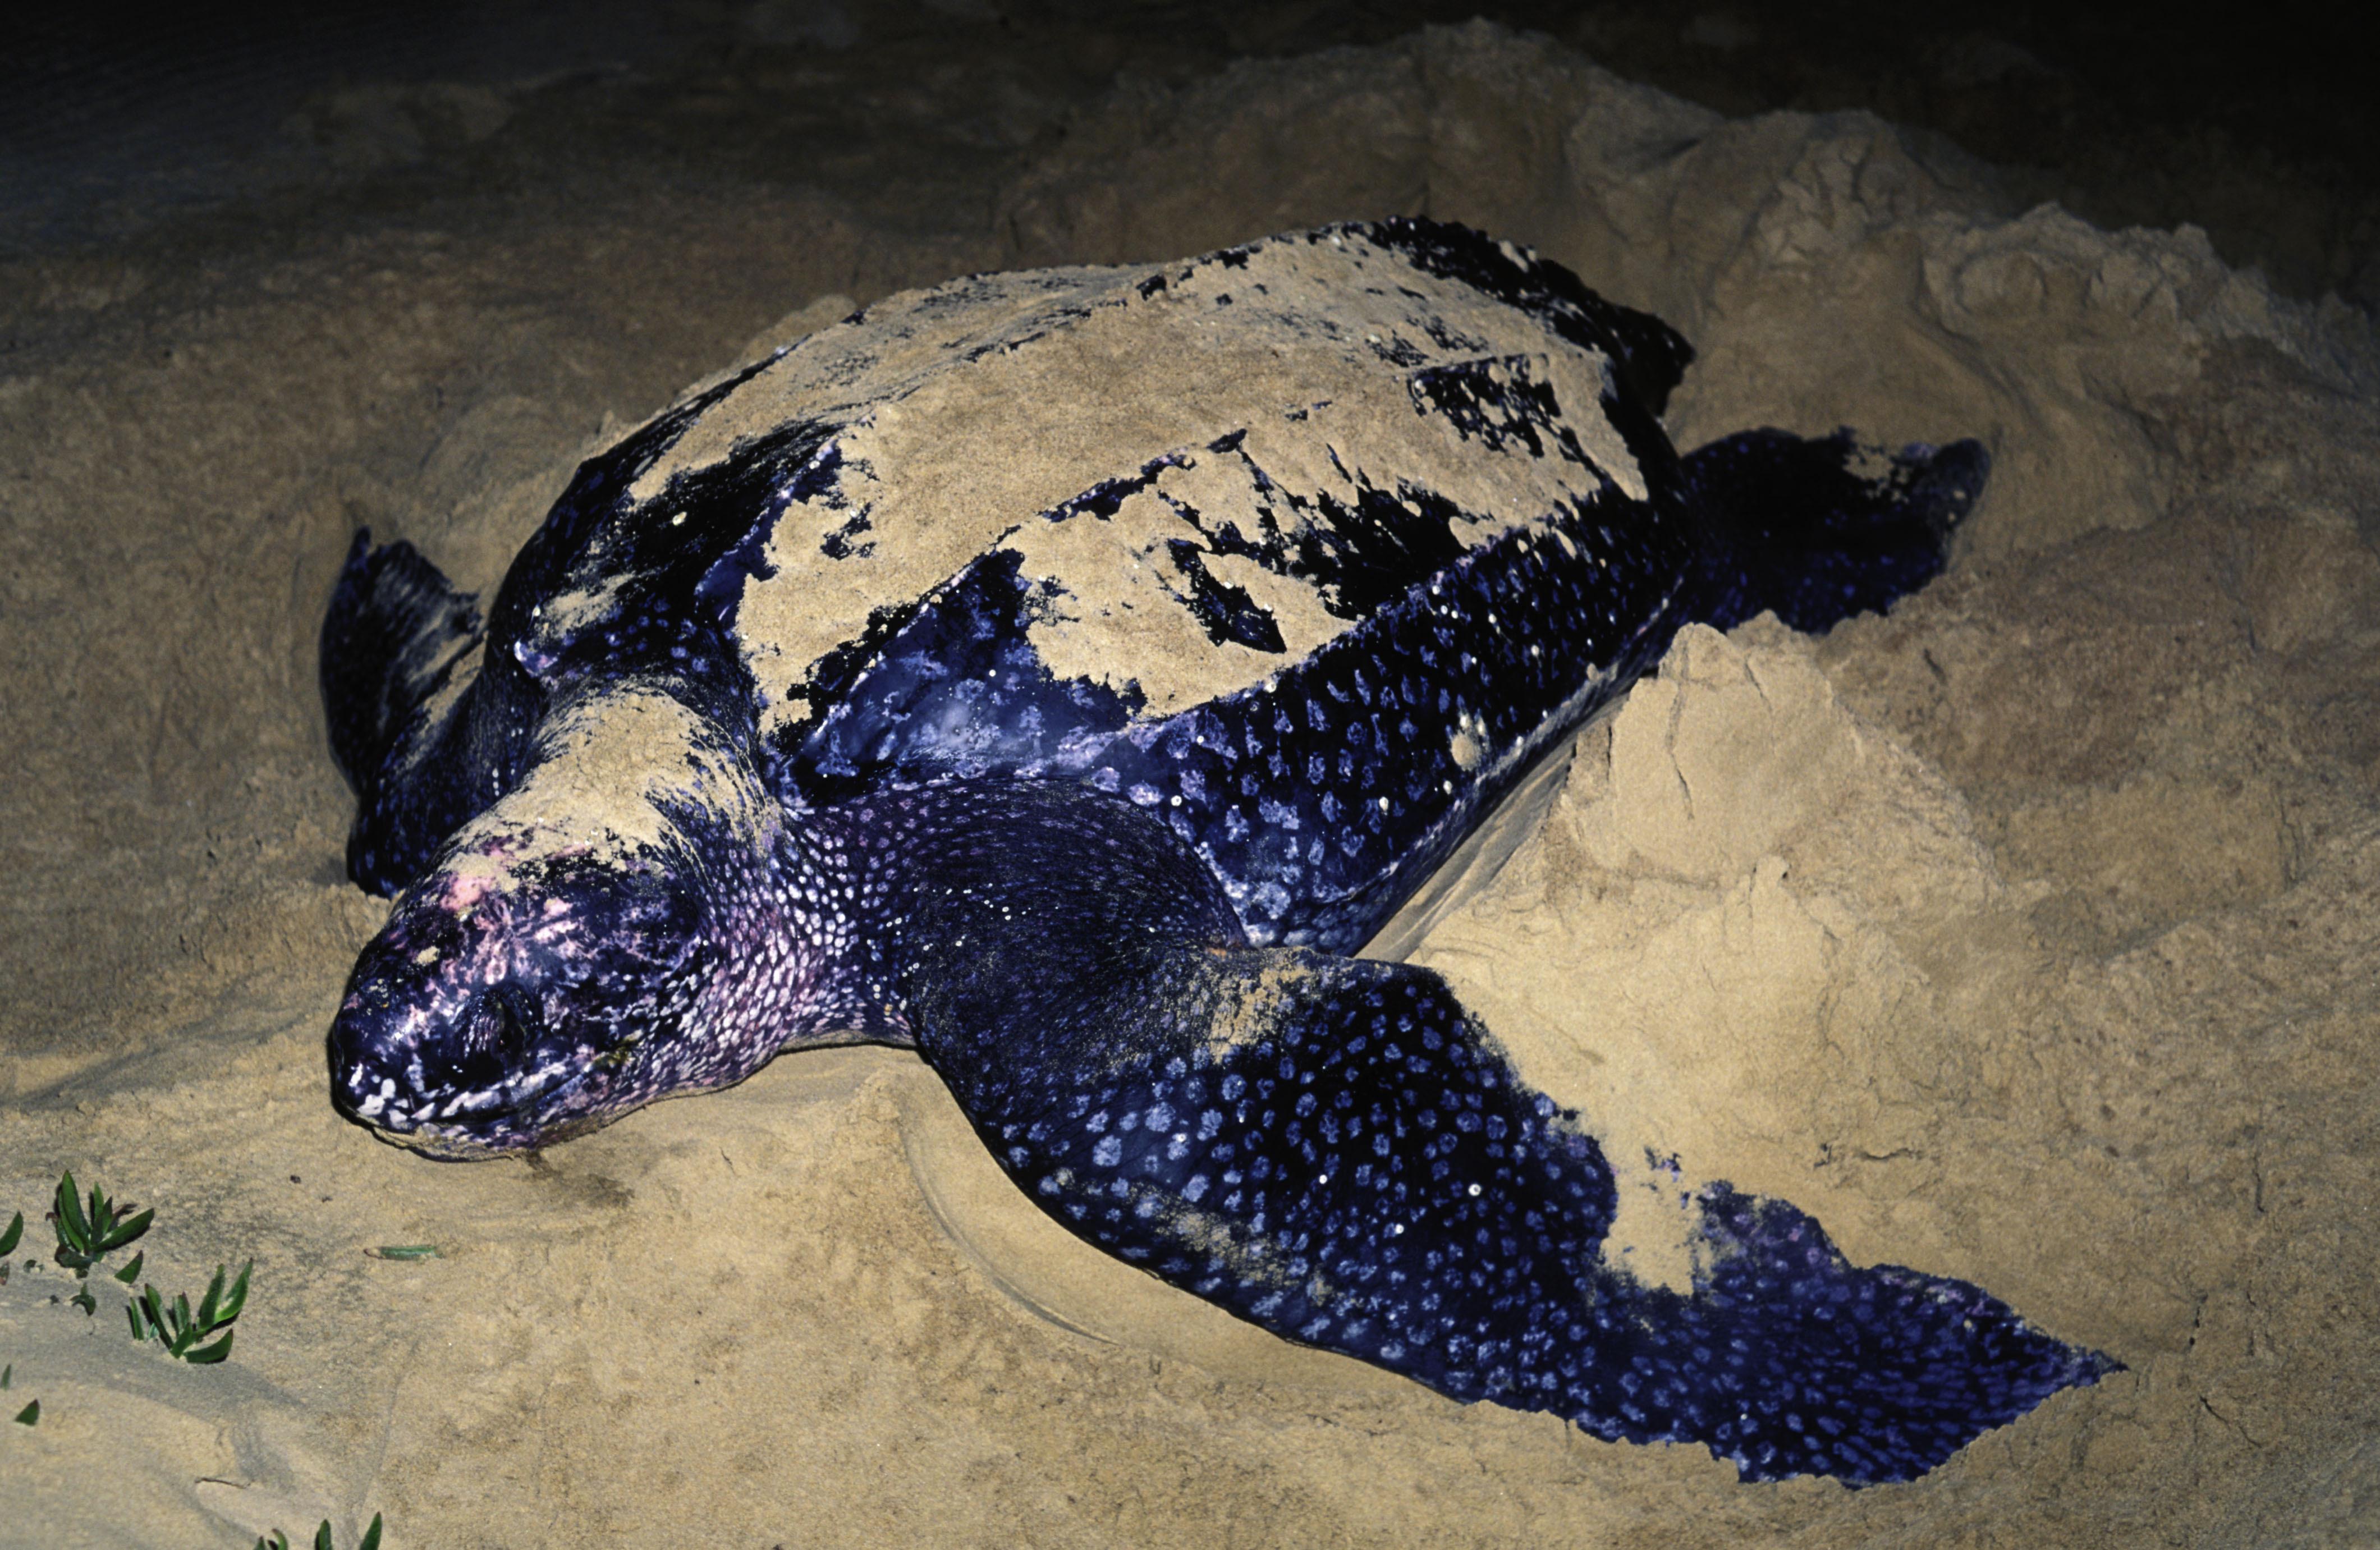 Leatherback turtle Dermochelys coriacea Laying eggs on the beach Worldwide